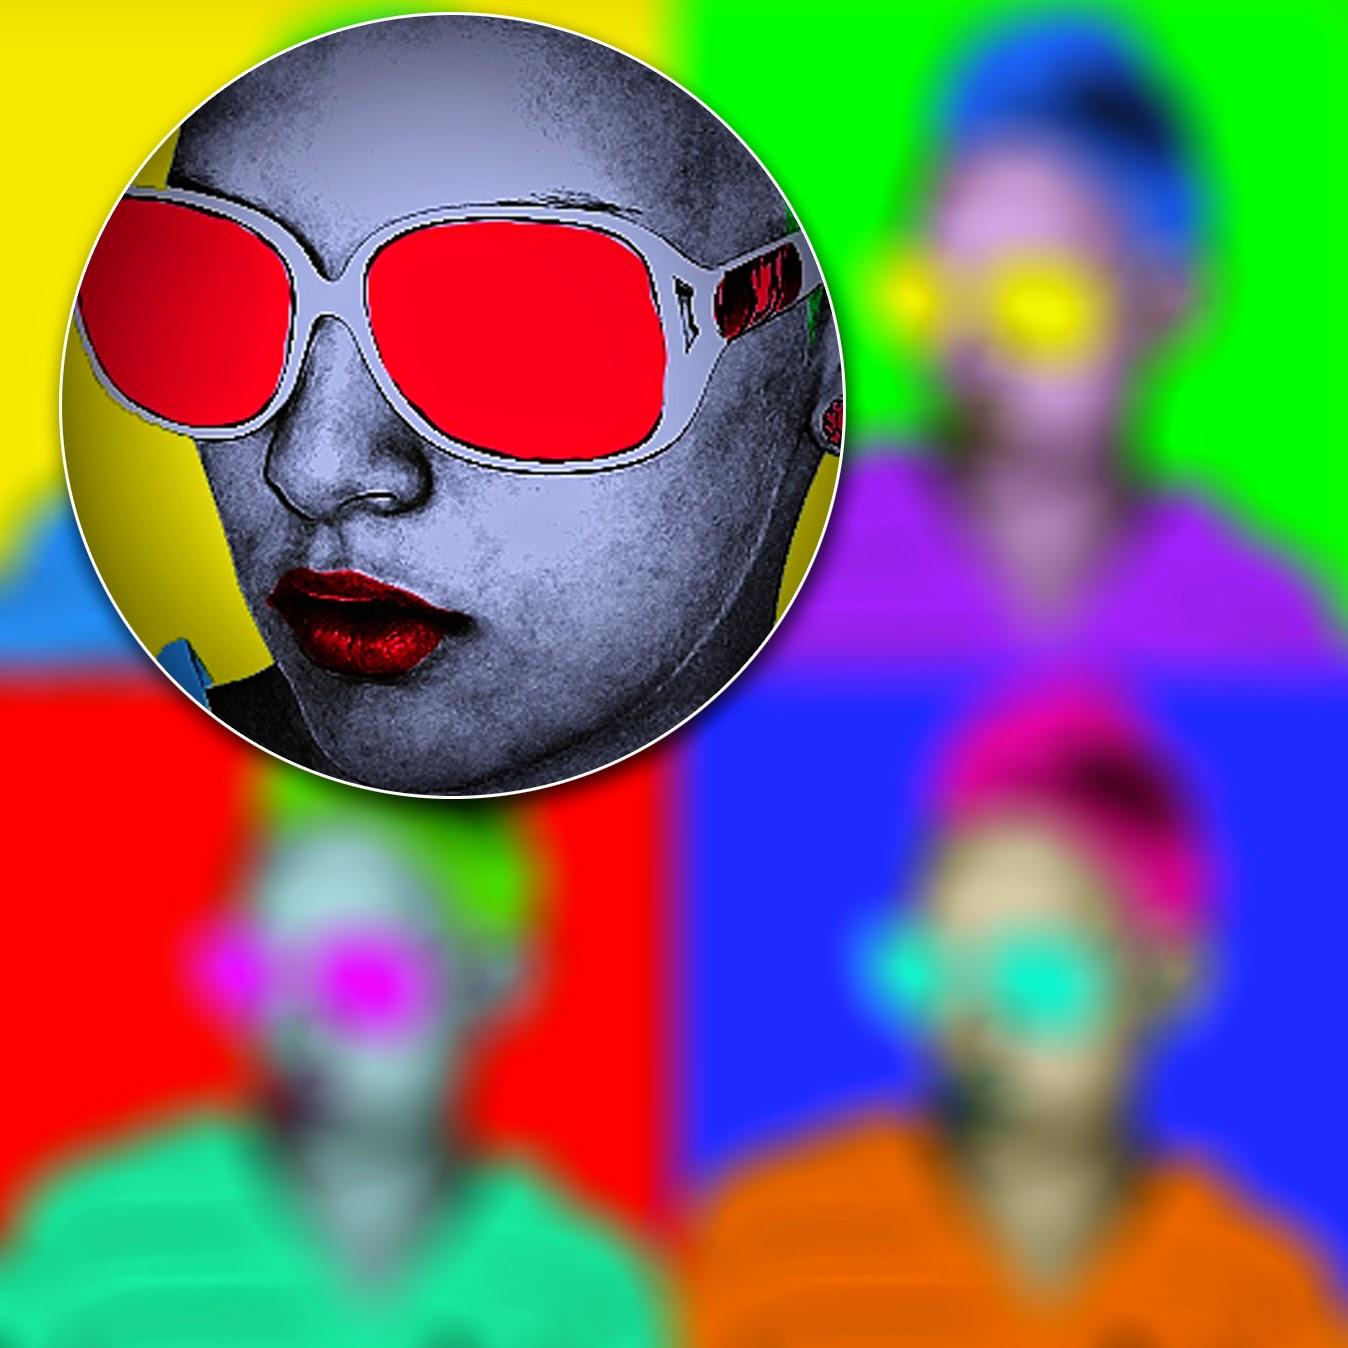 Cách tạo Andy Warhol Style Pop Art - Hướng dẫn Photoshop